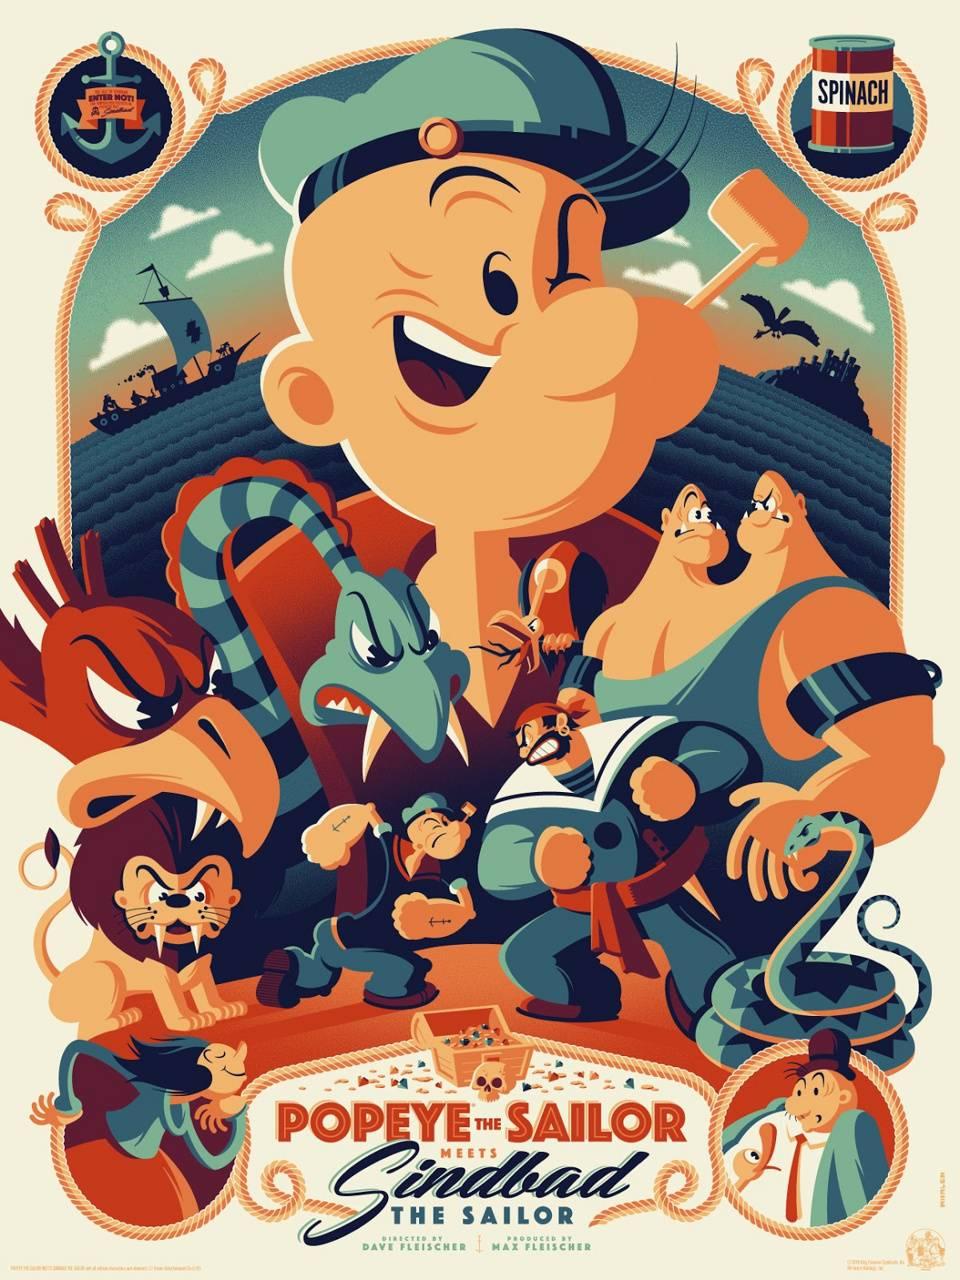 Popeye Poster Art